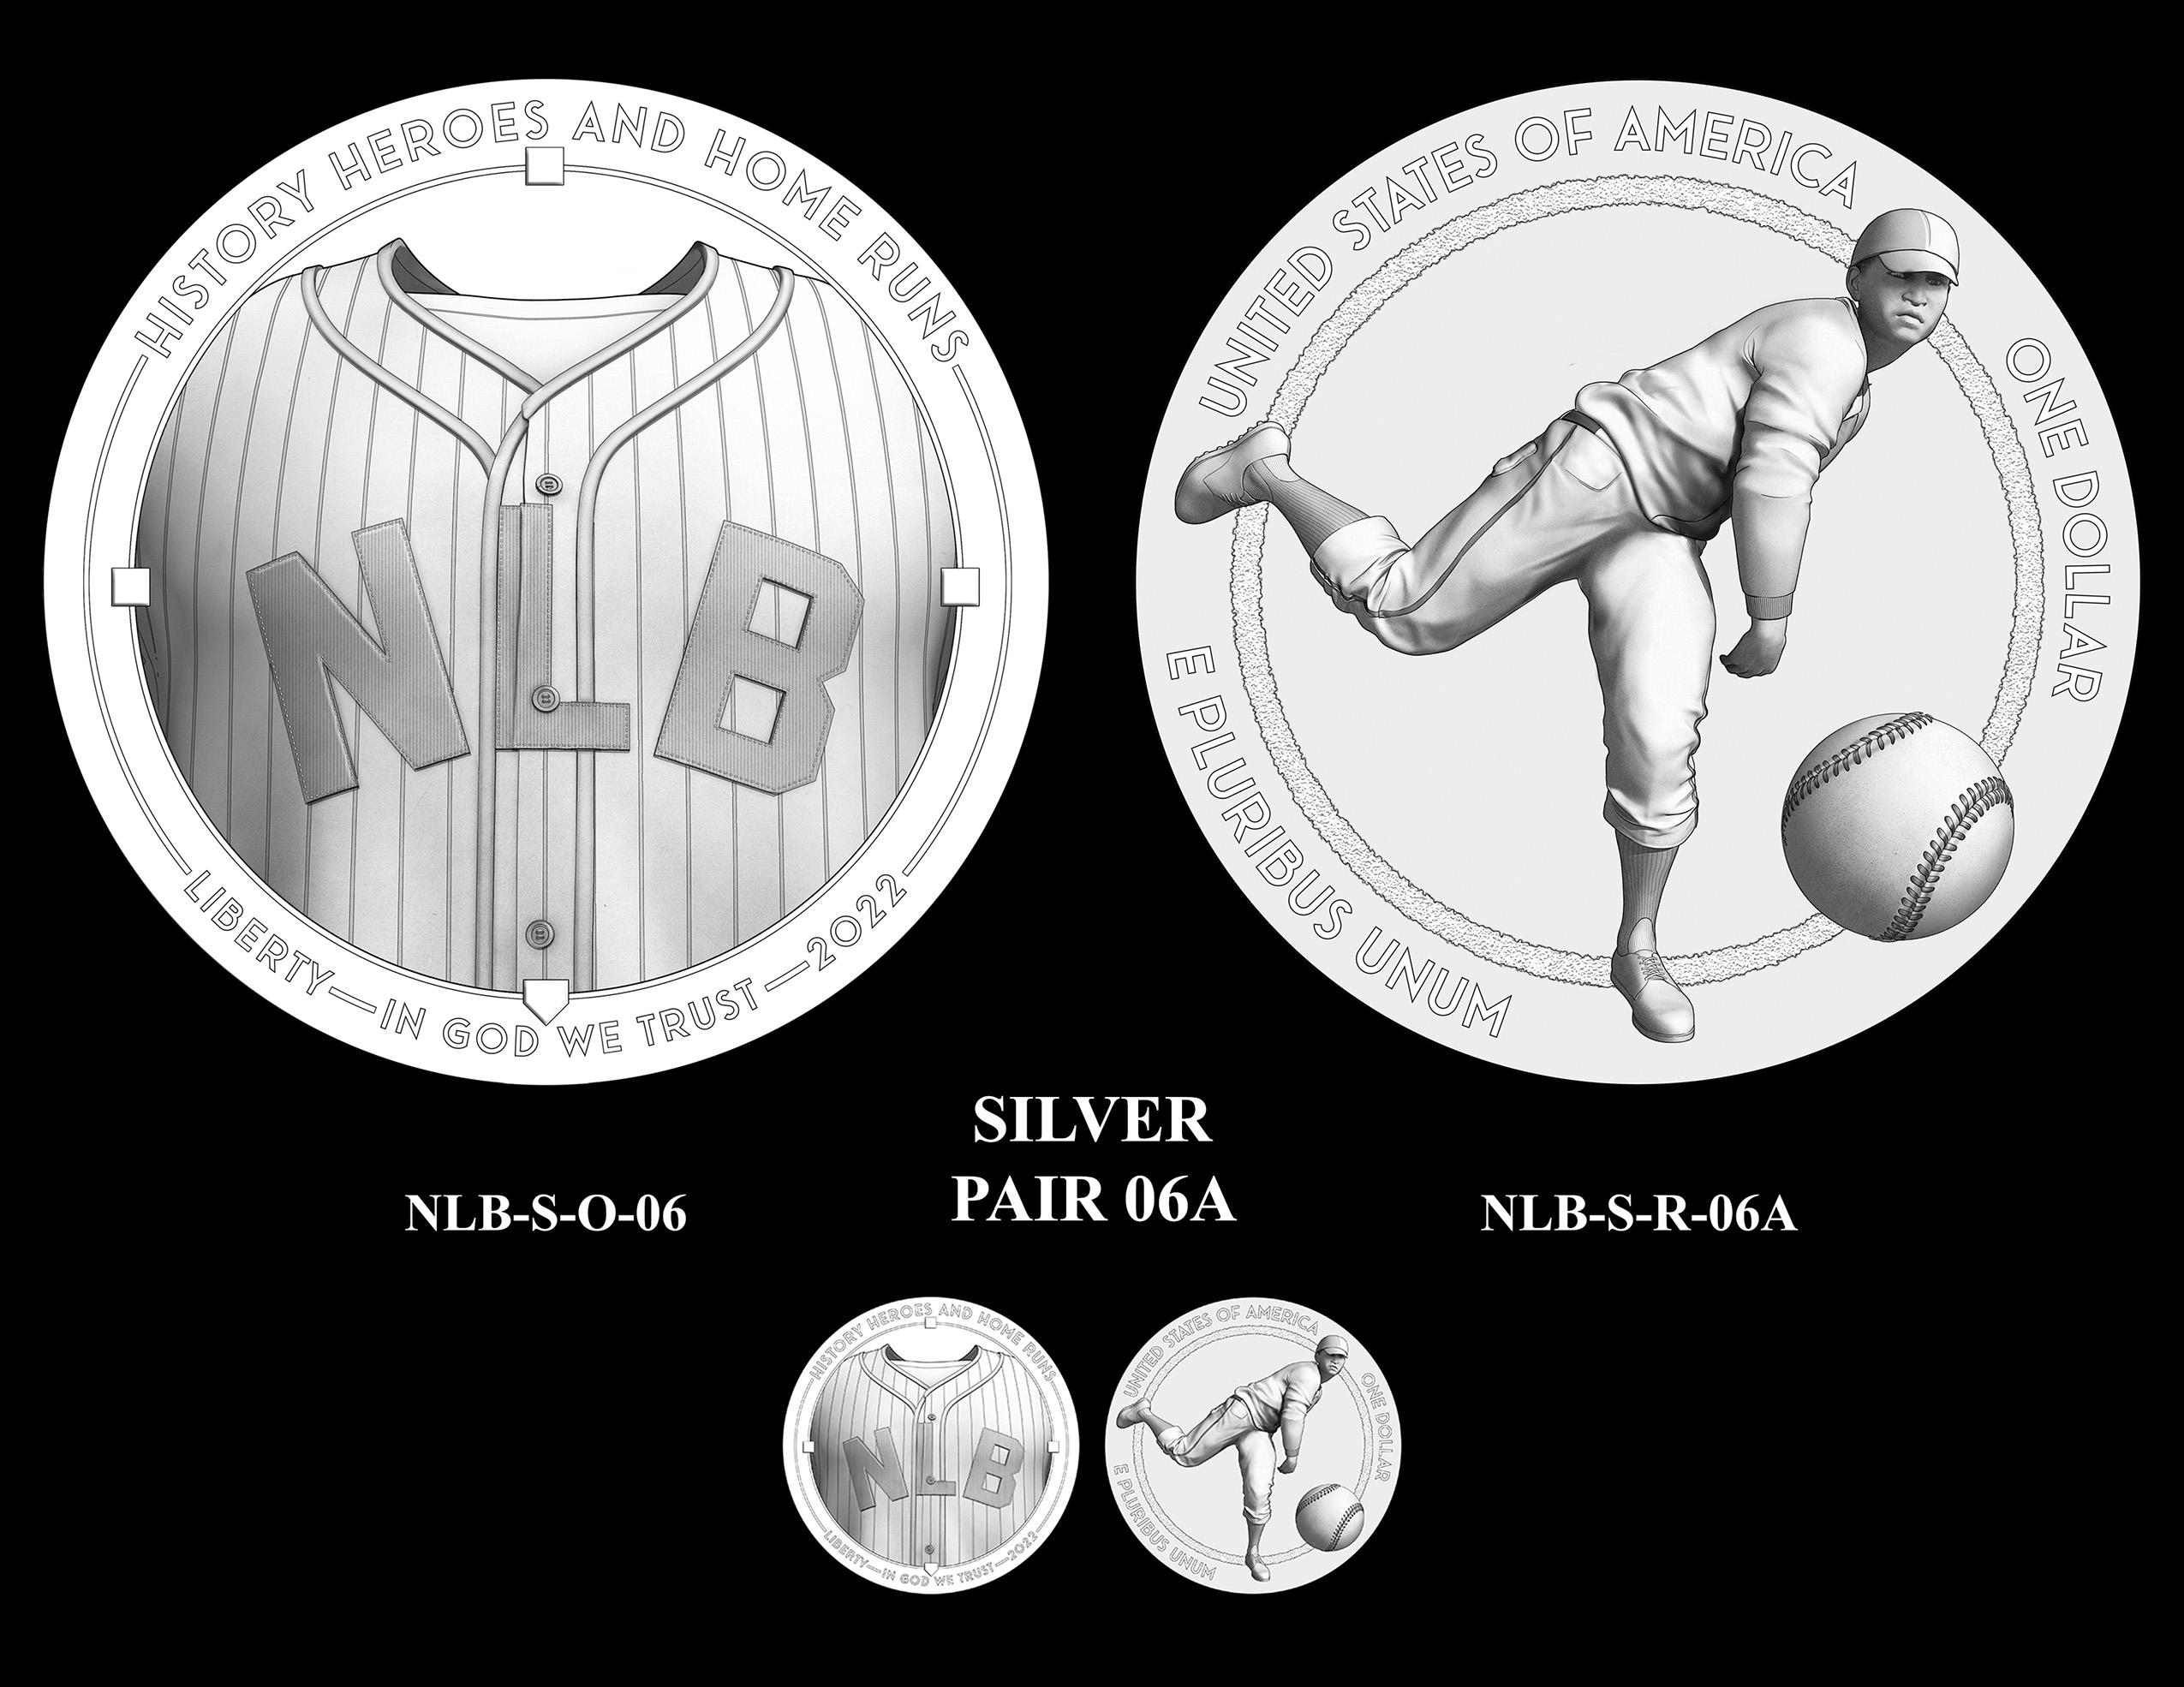 Silver Pair 06A -- Negro Leagues Baseball Commemorative Coin Program